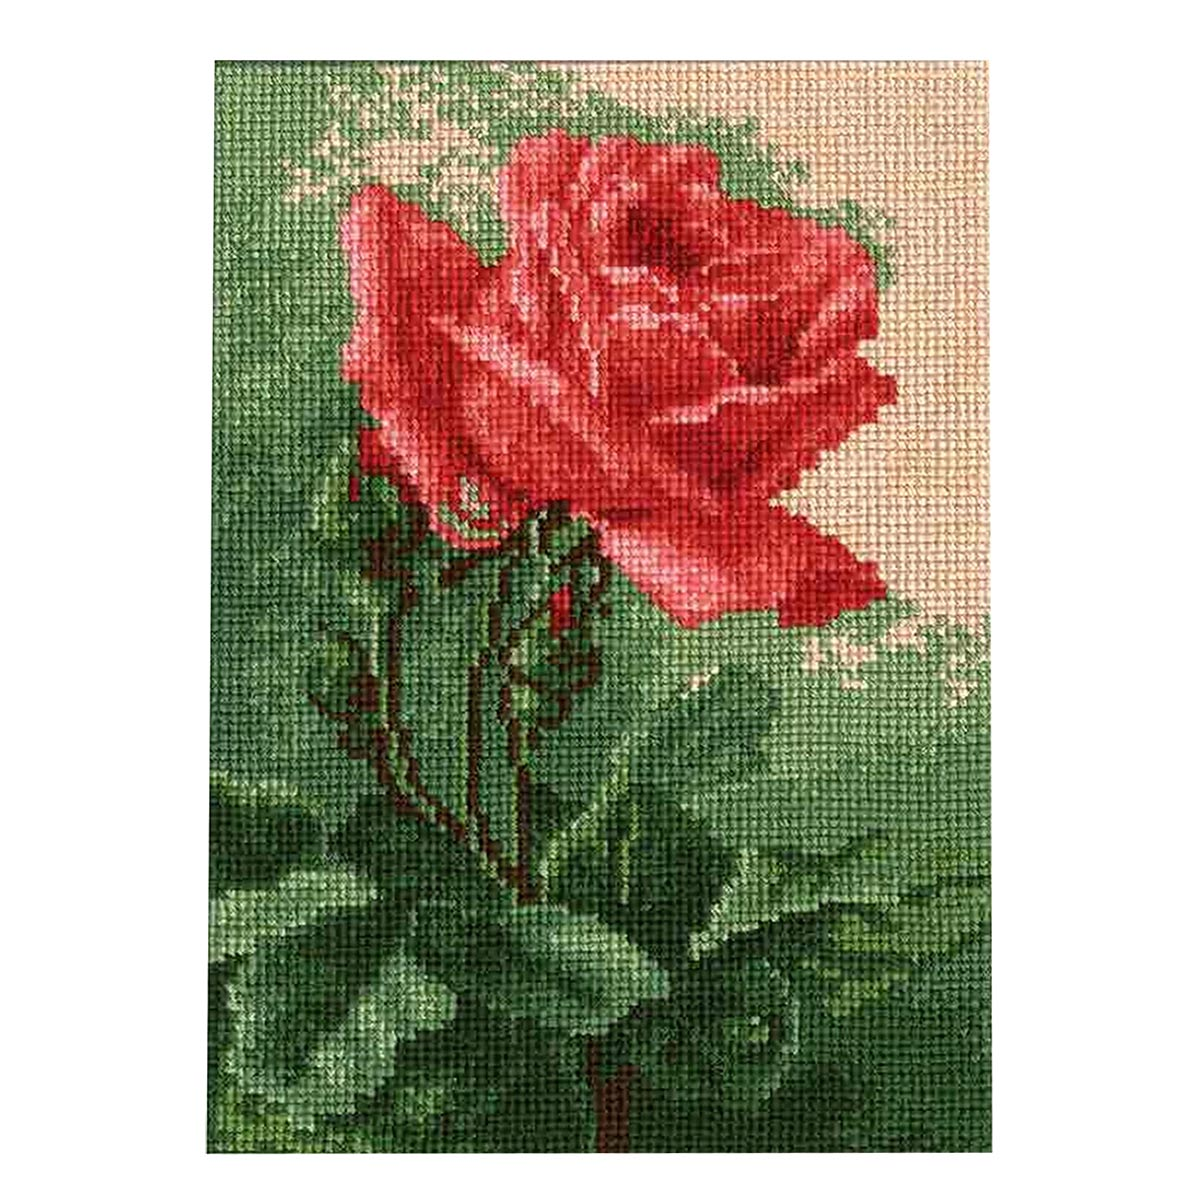 604 Набор для вышивания Hobby&Pro 'Алая роза', 21*14,5 см